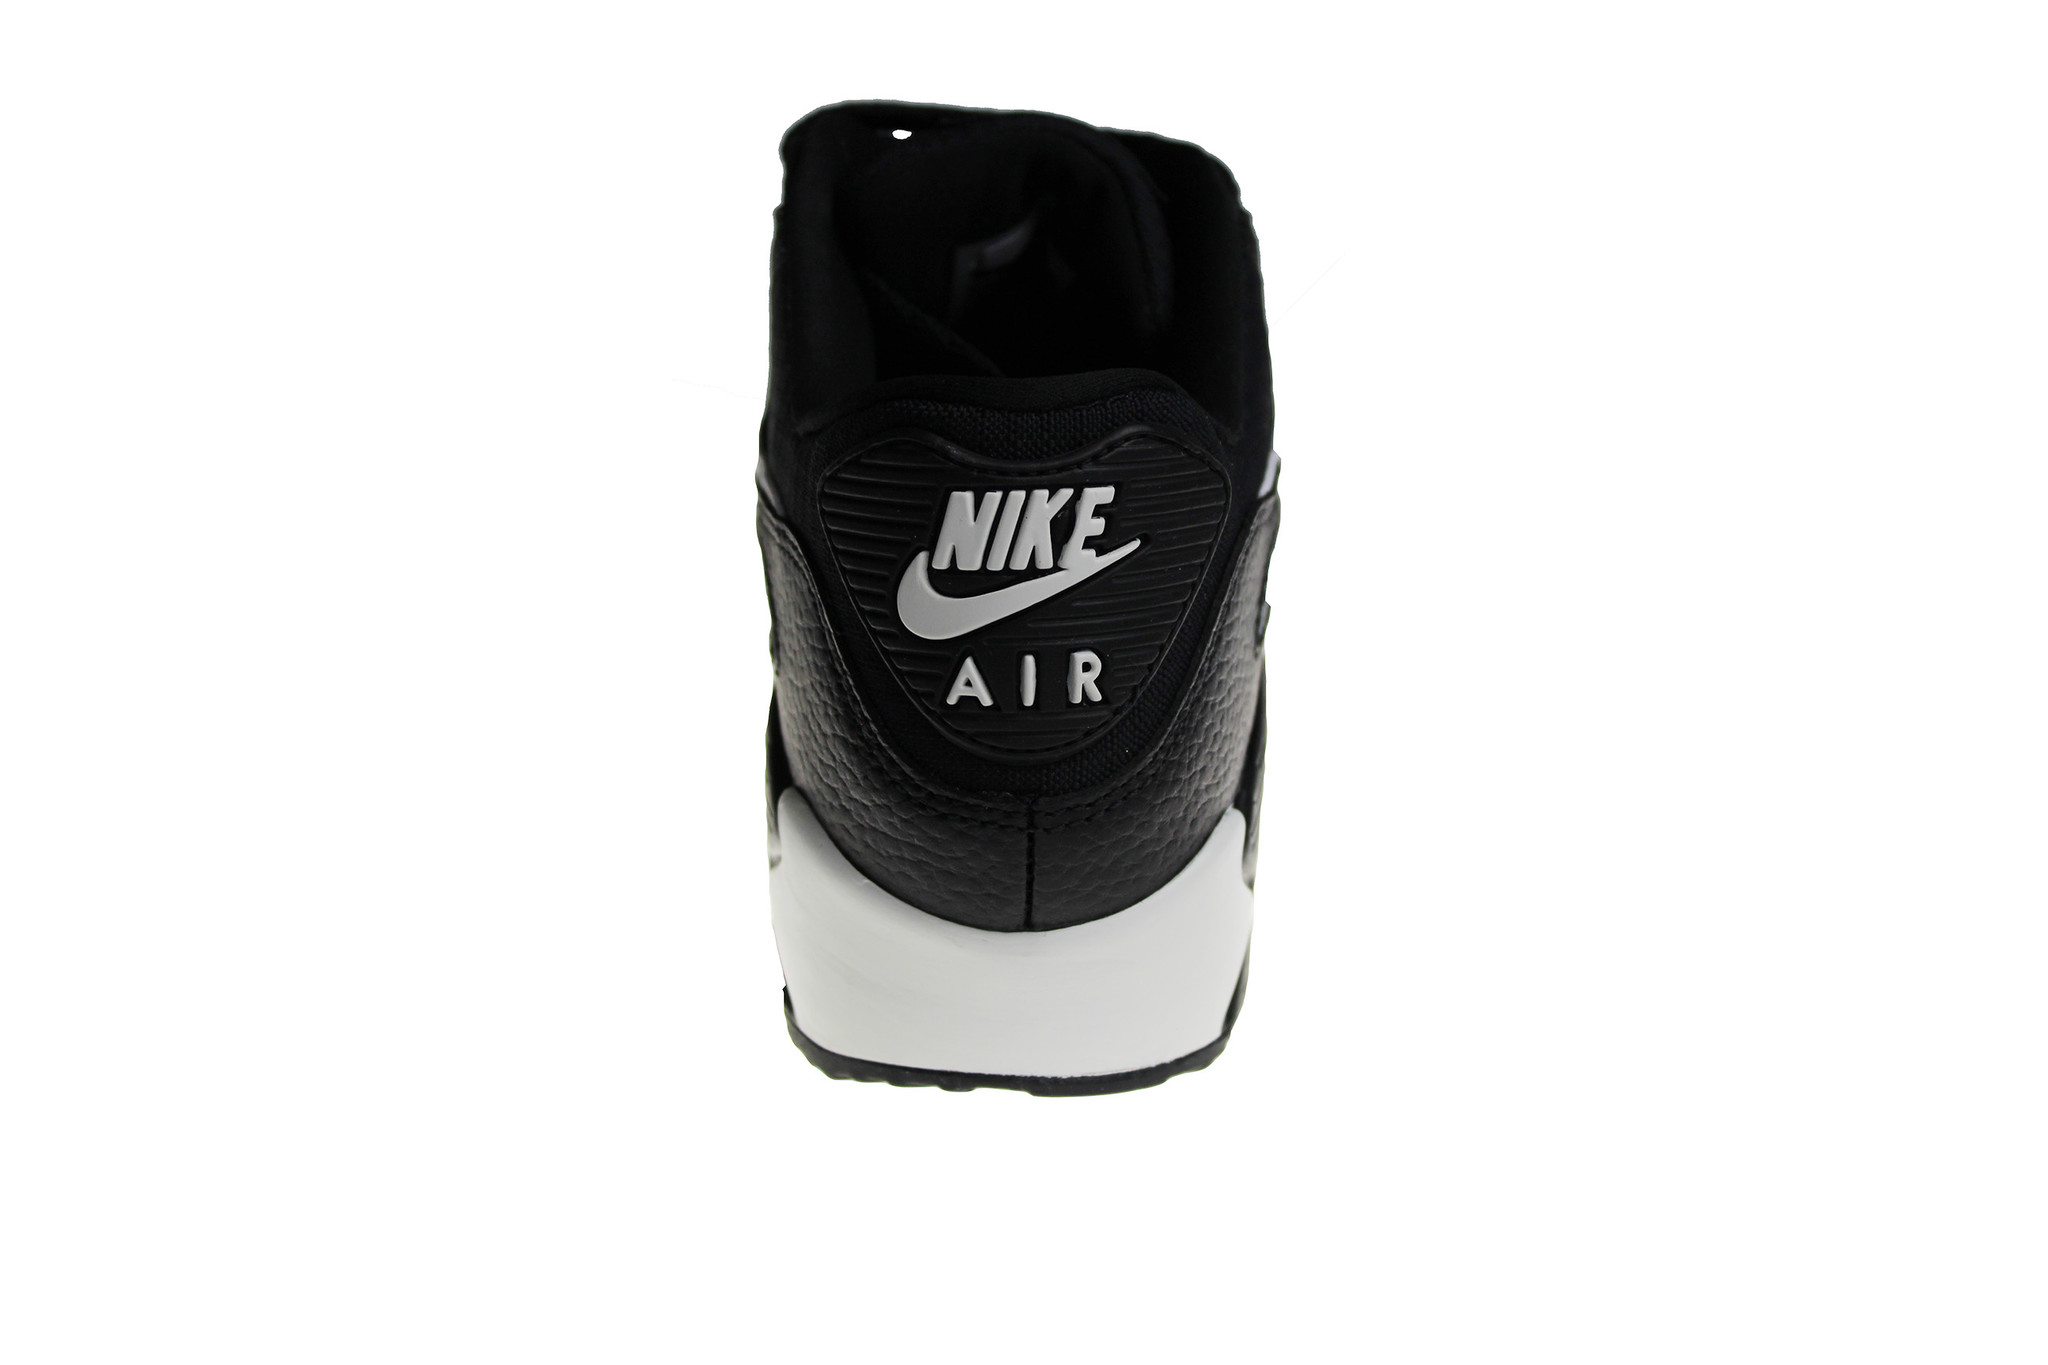 a59749b7be4 Nike Wmns Air Max 90 Zwart/Wit 325213 060 Dames | Sneakerpaleis